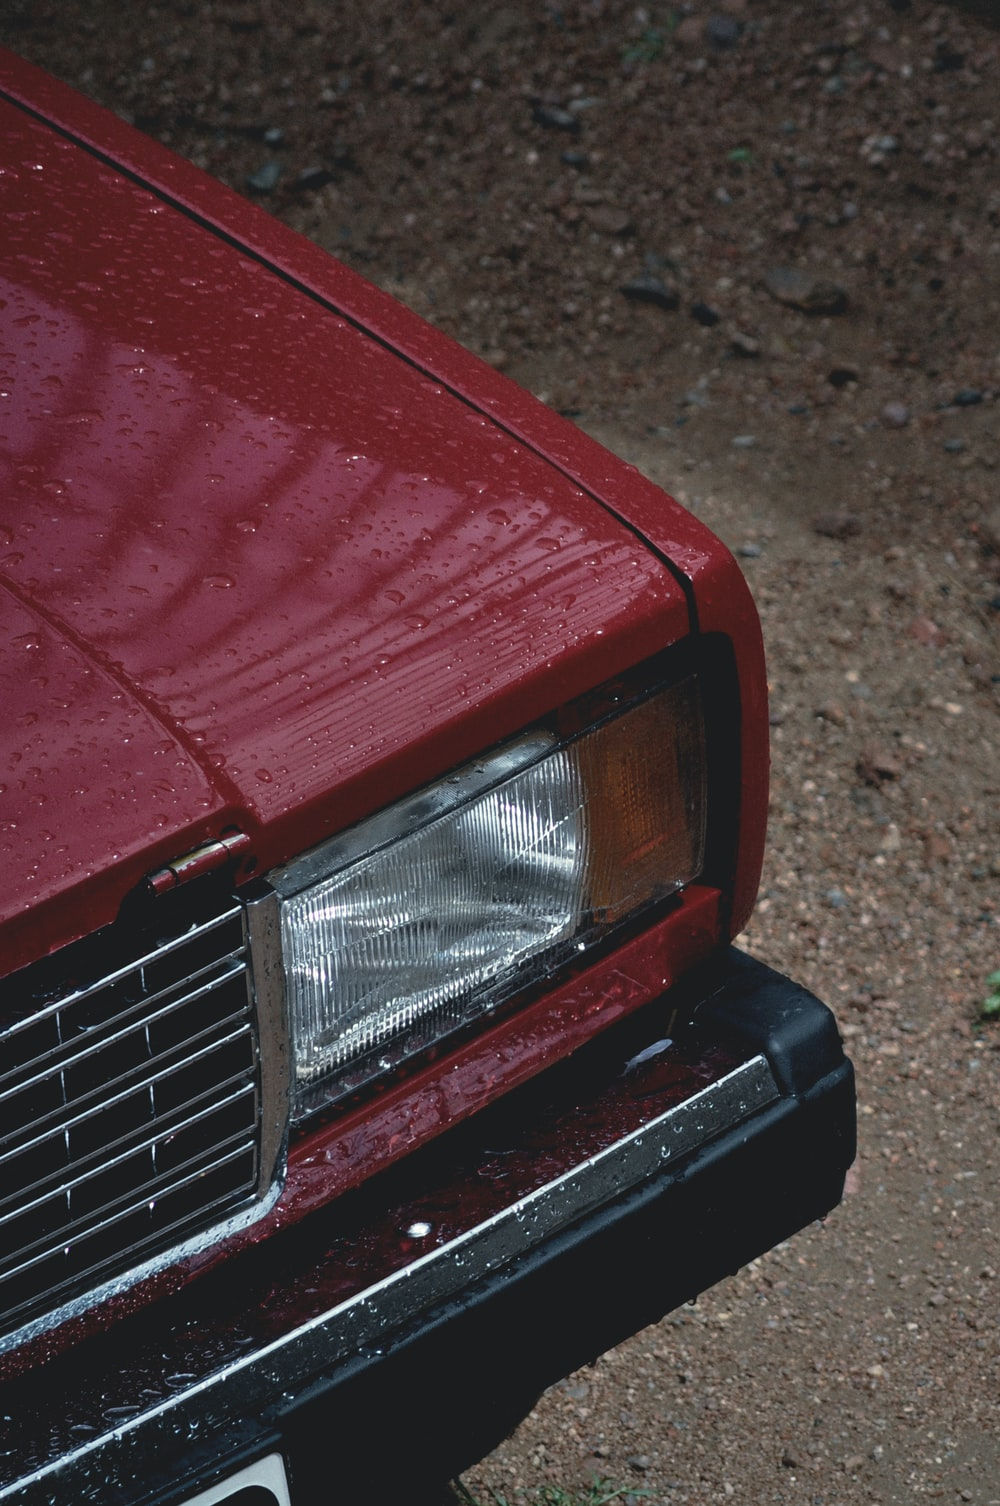 red car on brown soil